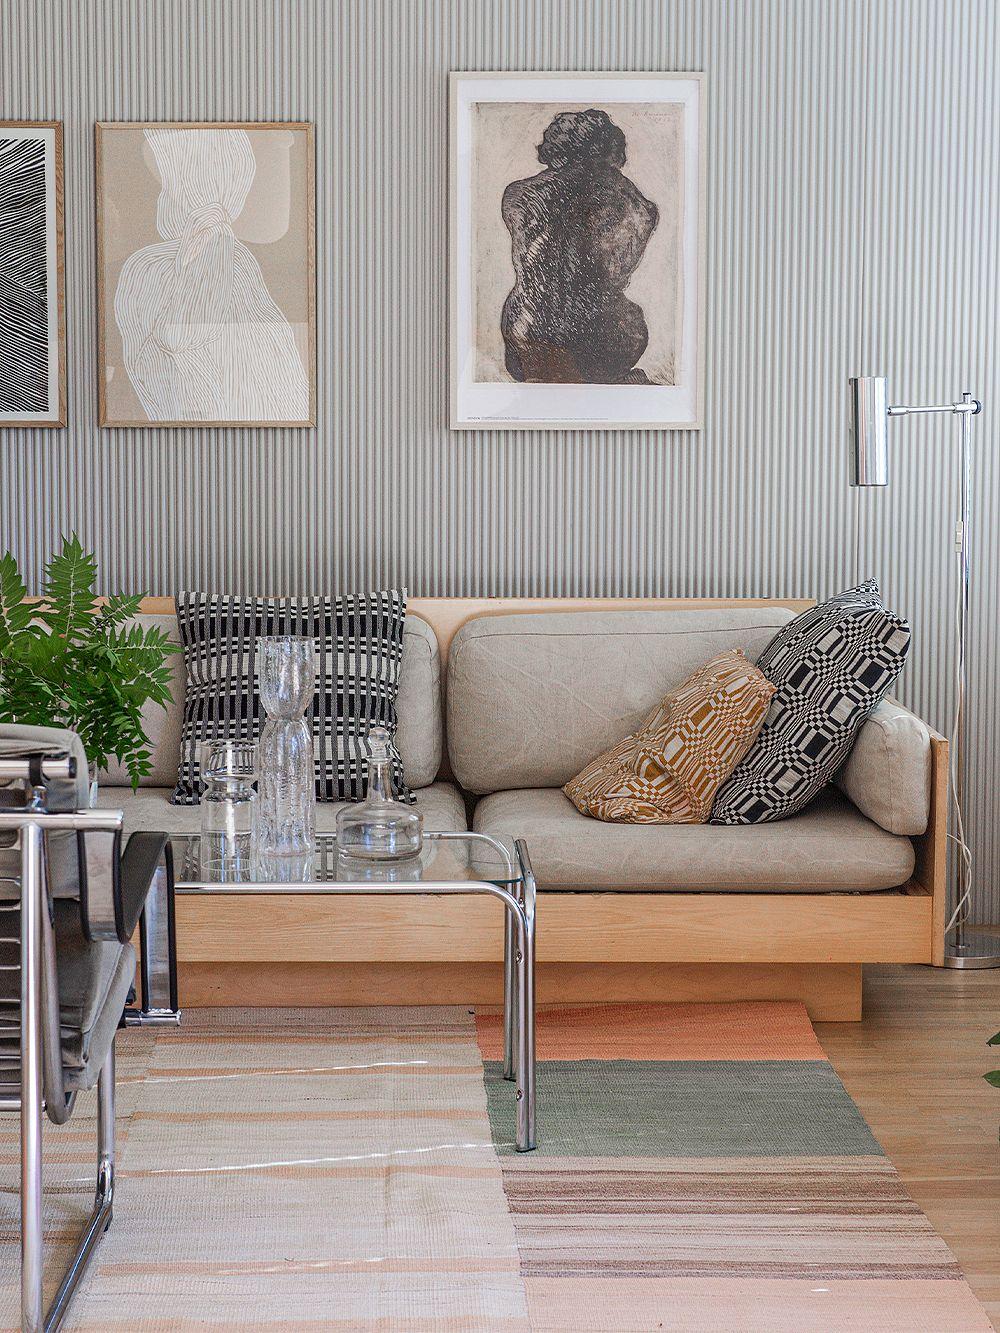 Johanna Gullichsen Doris and Nereus cushion covers